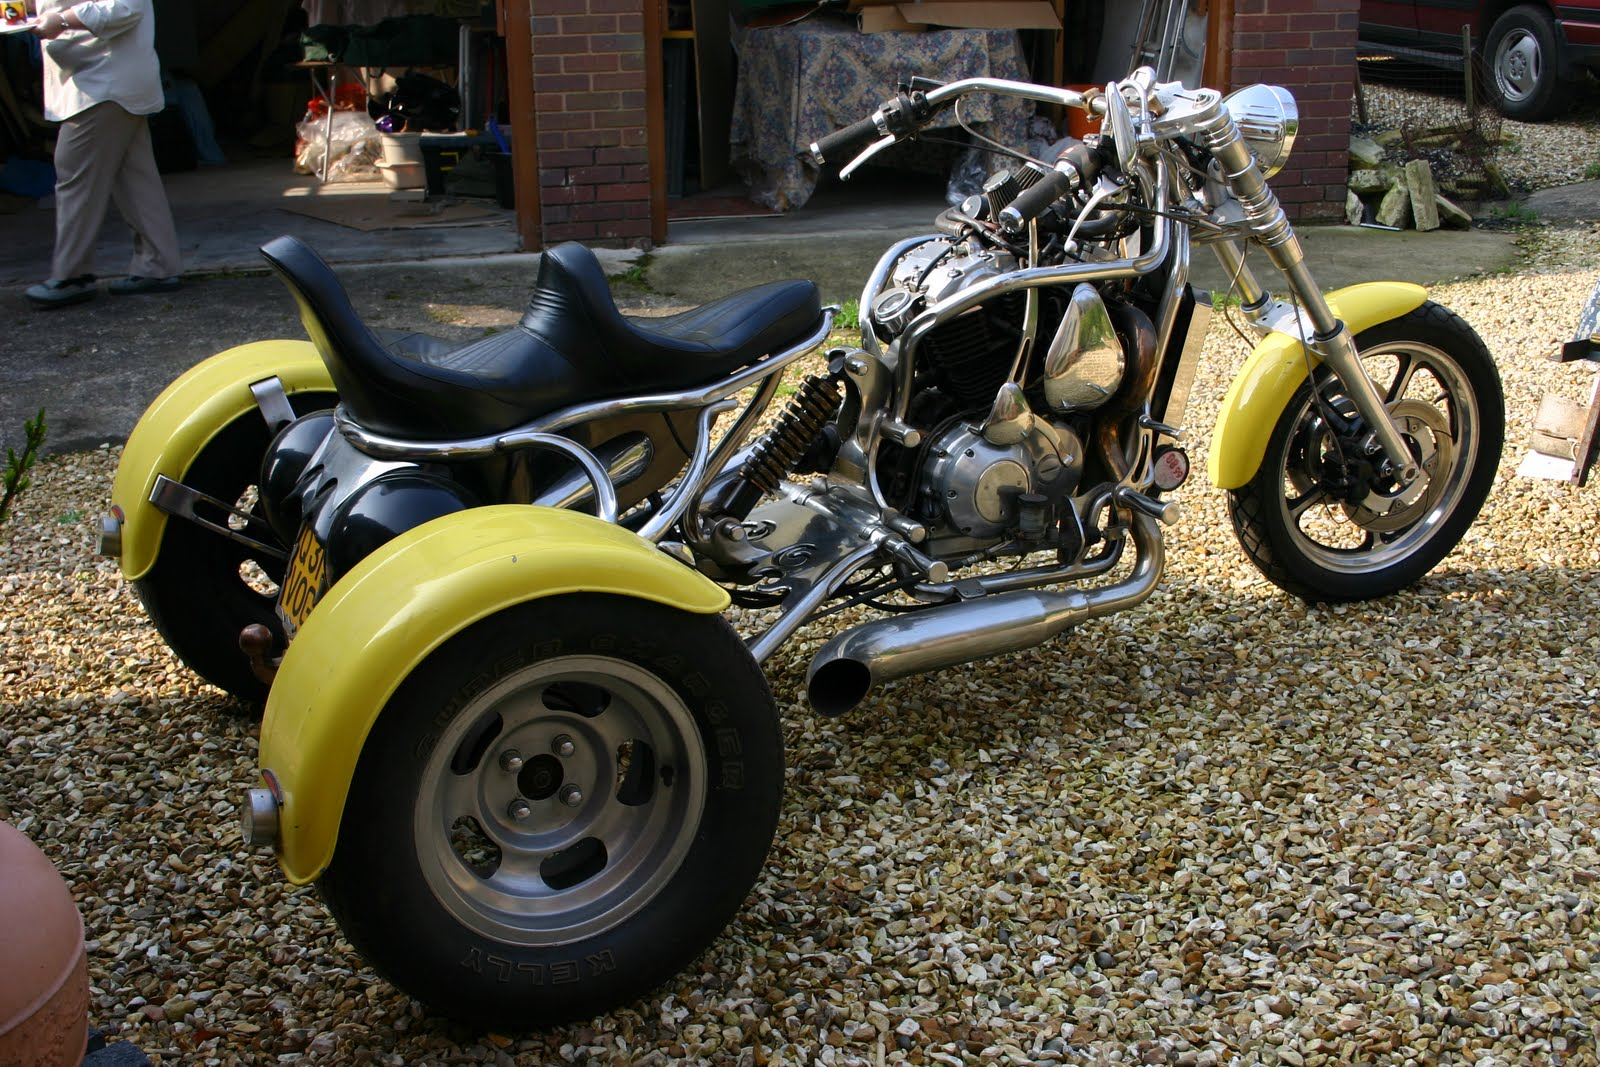 trike trikes custom motorcycle motorcycles win motorbikes yellow uploaded user